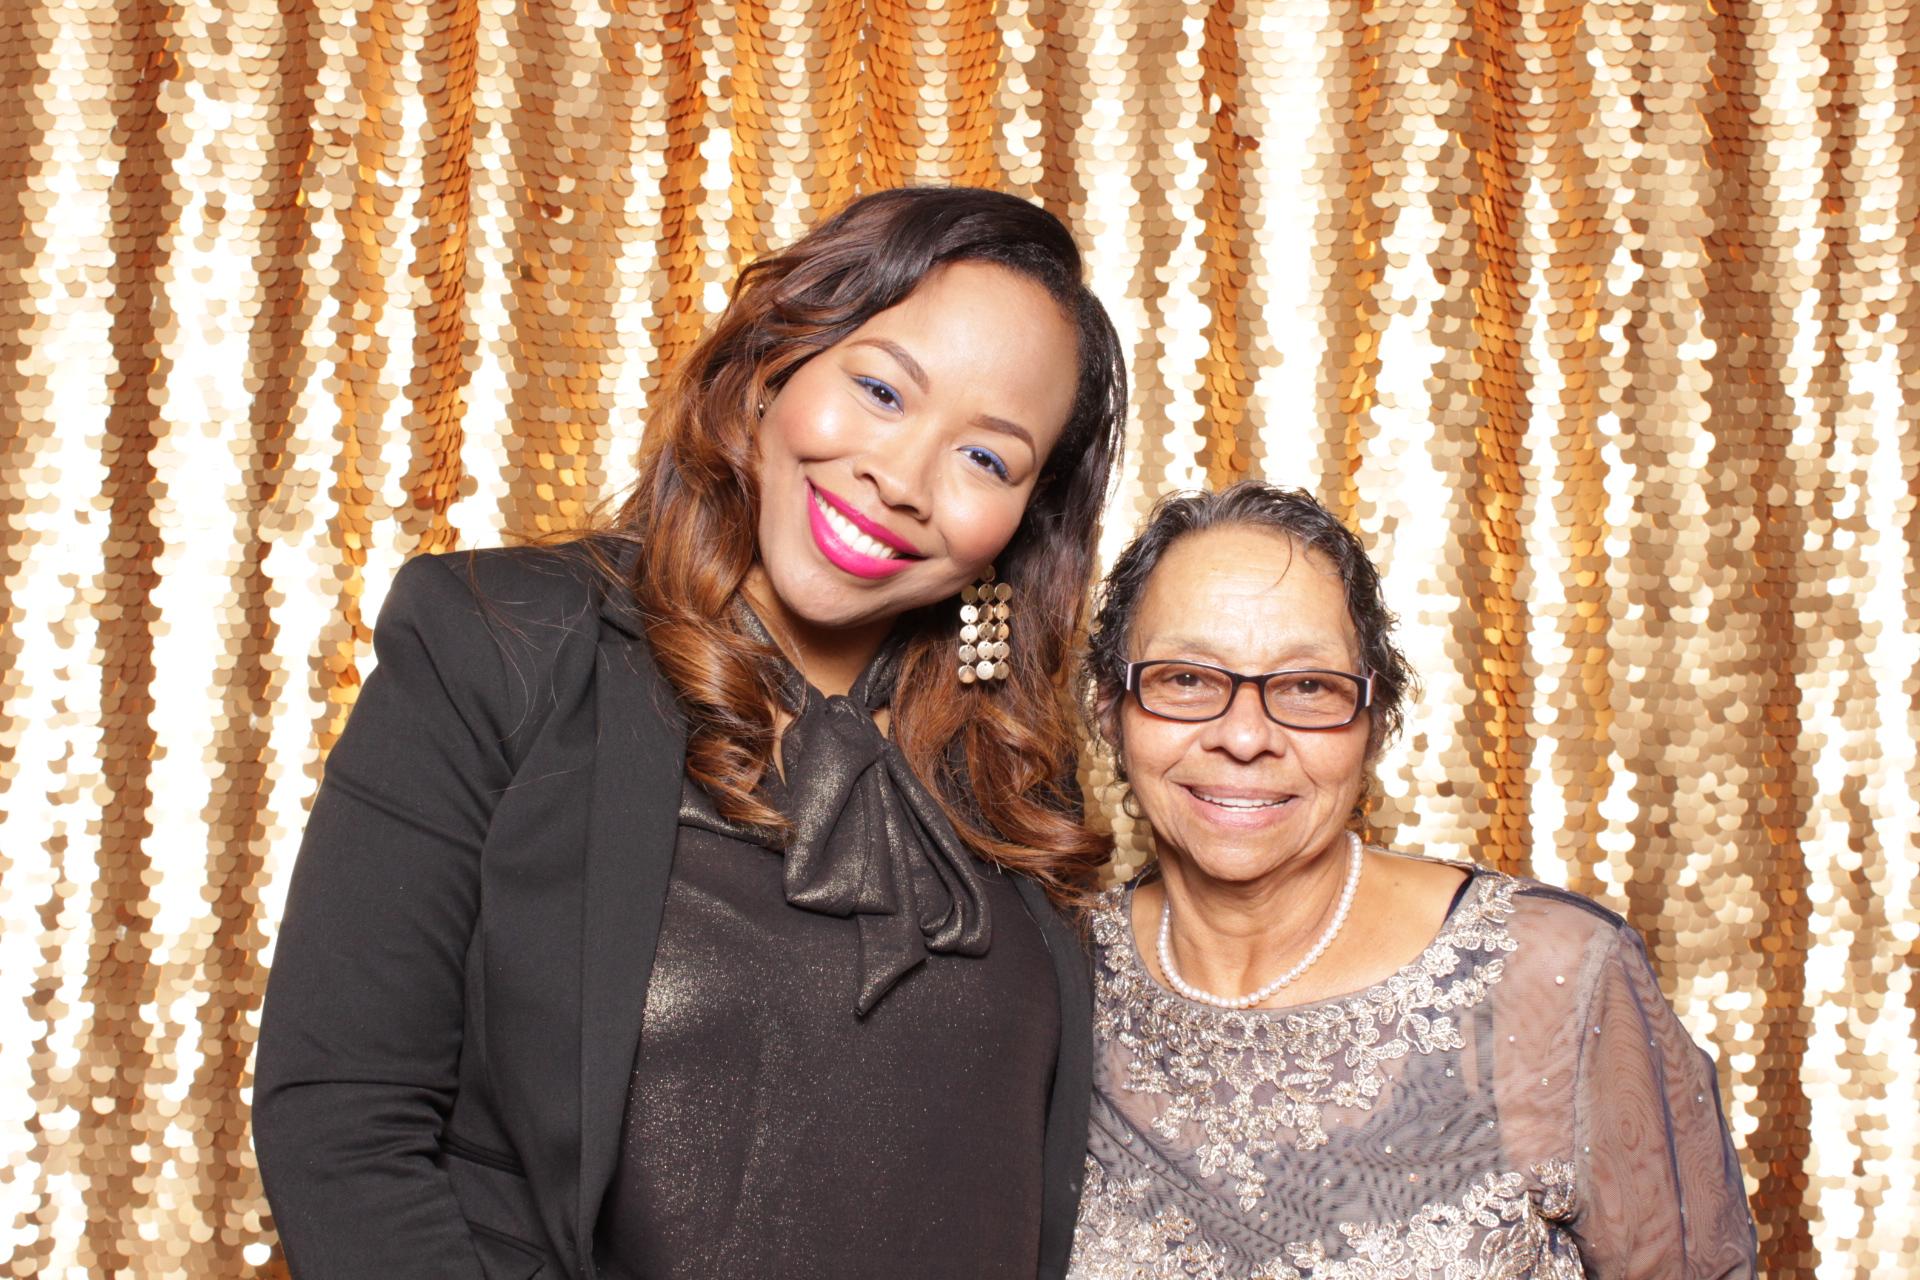 Brenda's 75th Birthday